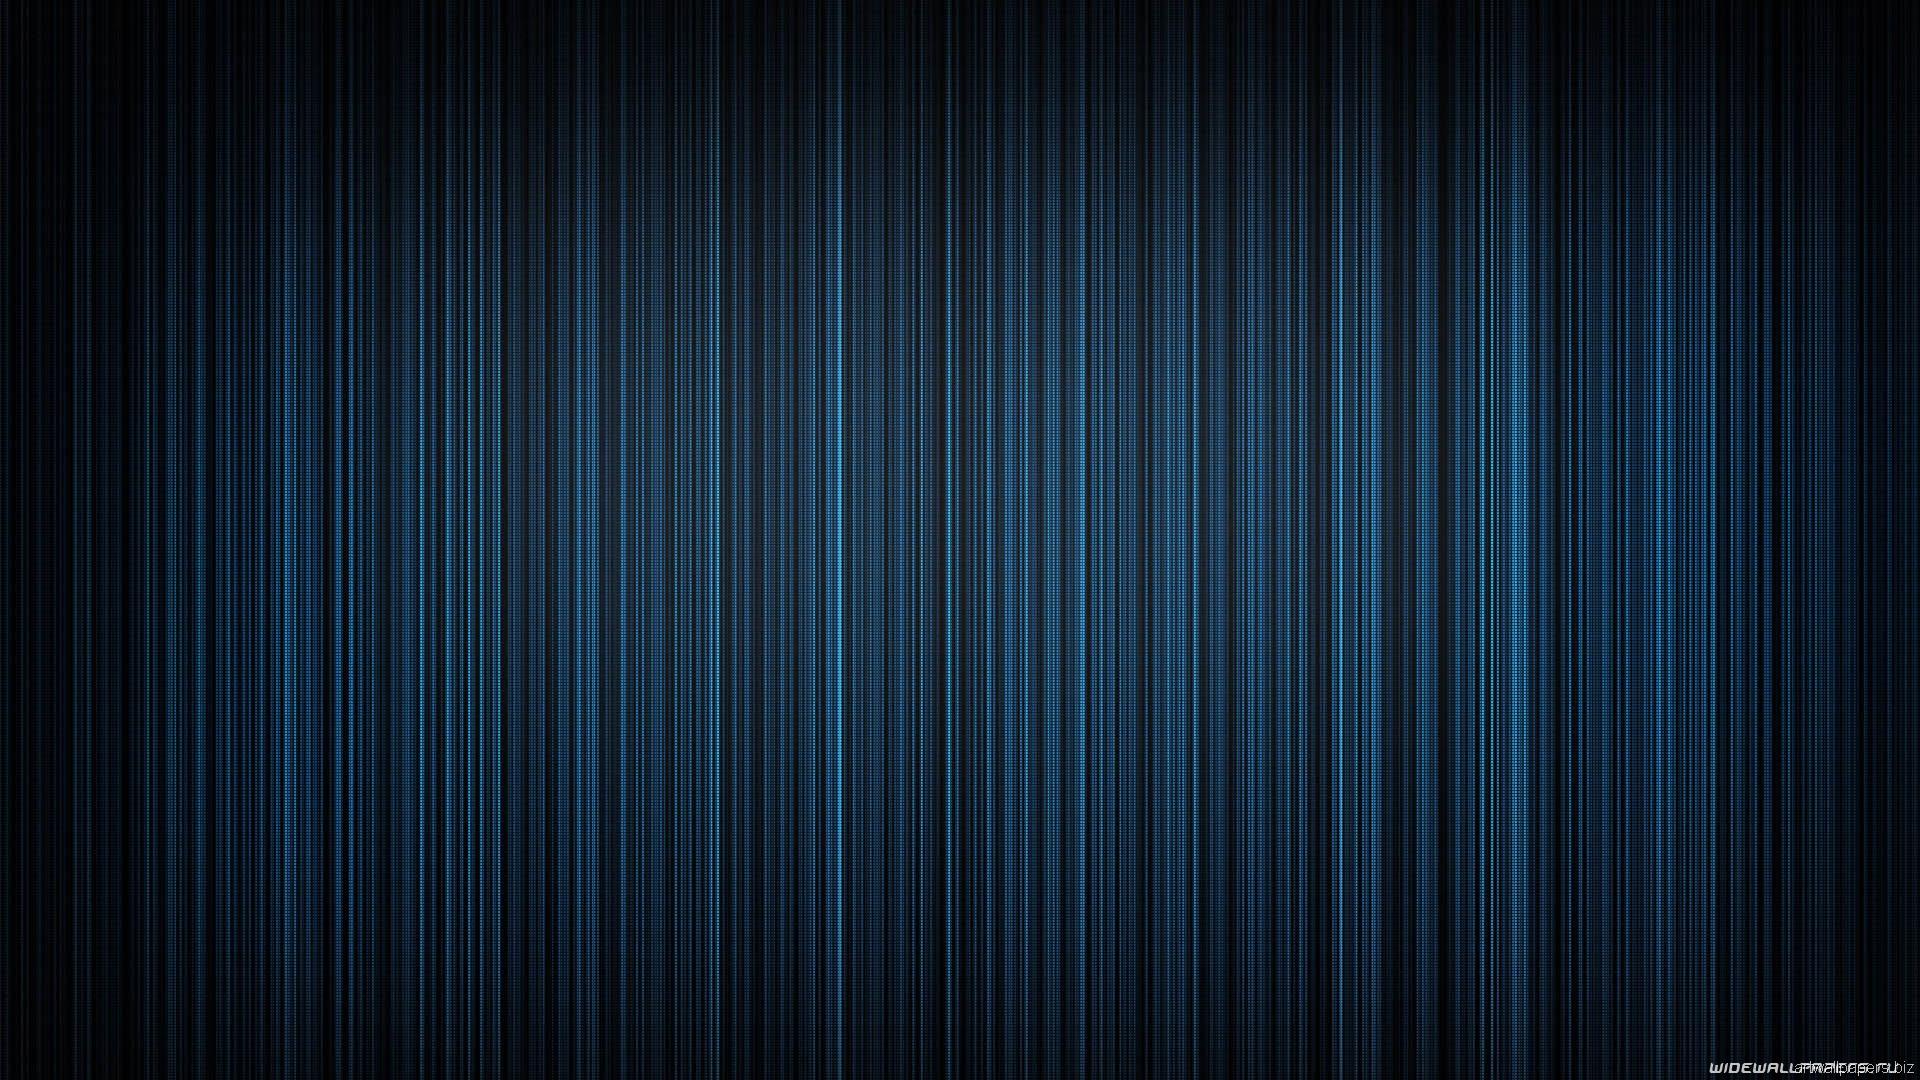 43 Wide Wallpapers 1920x1080 On Wallpapersafari